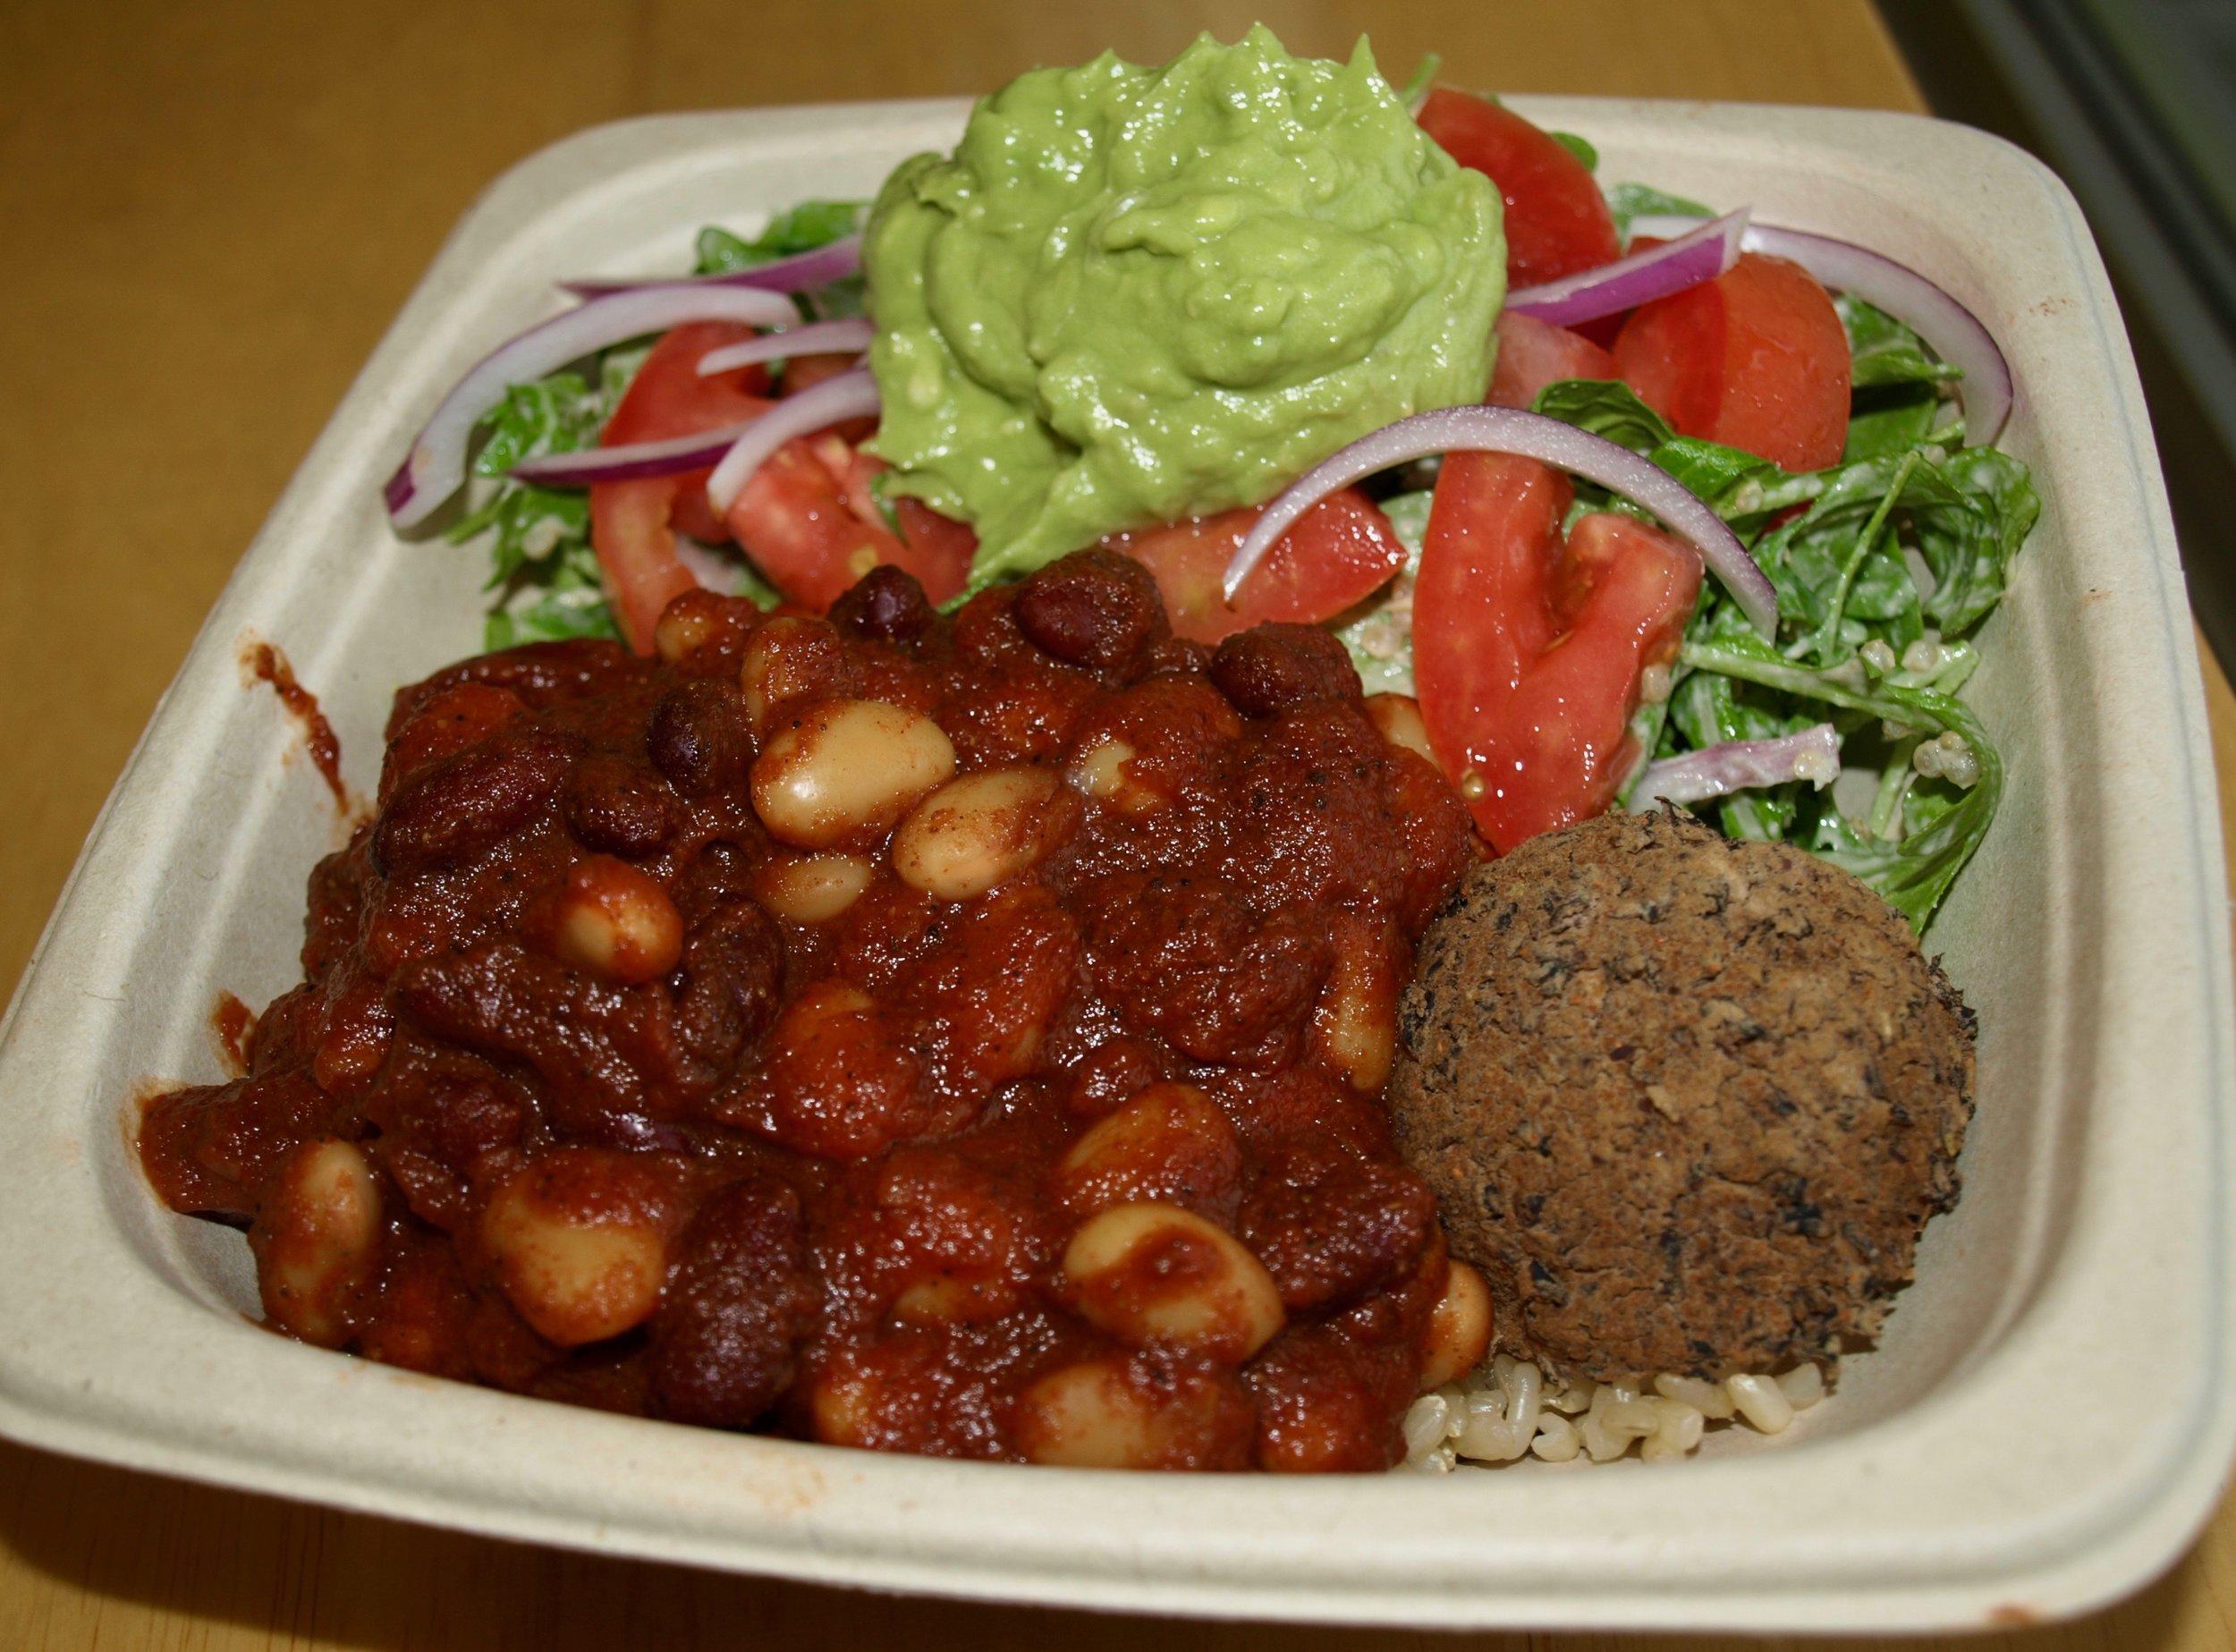 Some Foodie favorites from Plantwise include, half & half of avocado quinoa salad (arugula, quinoa, red onion, avocado mash, tomato, sunflower dijon vinaigrette) and chili bowl (bean chili and beanballs).